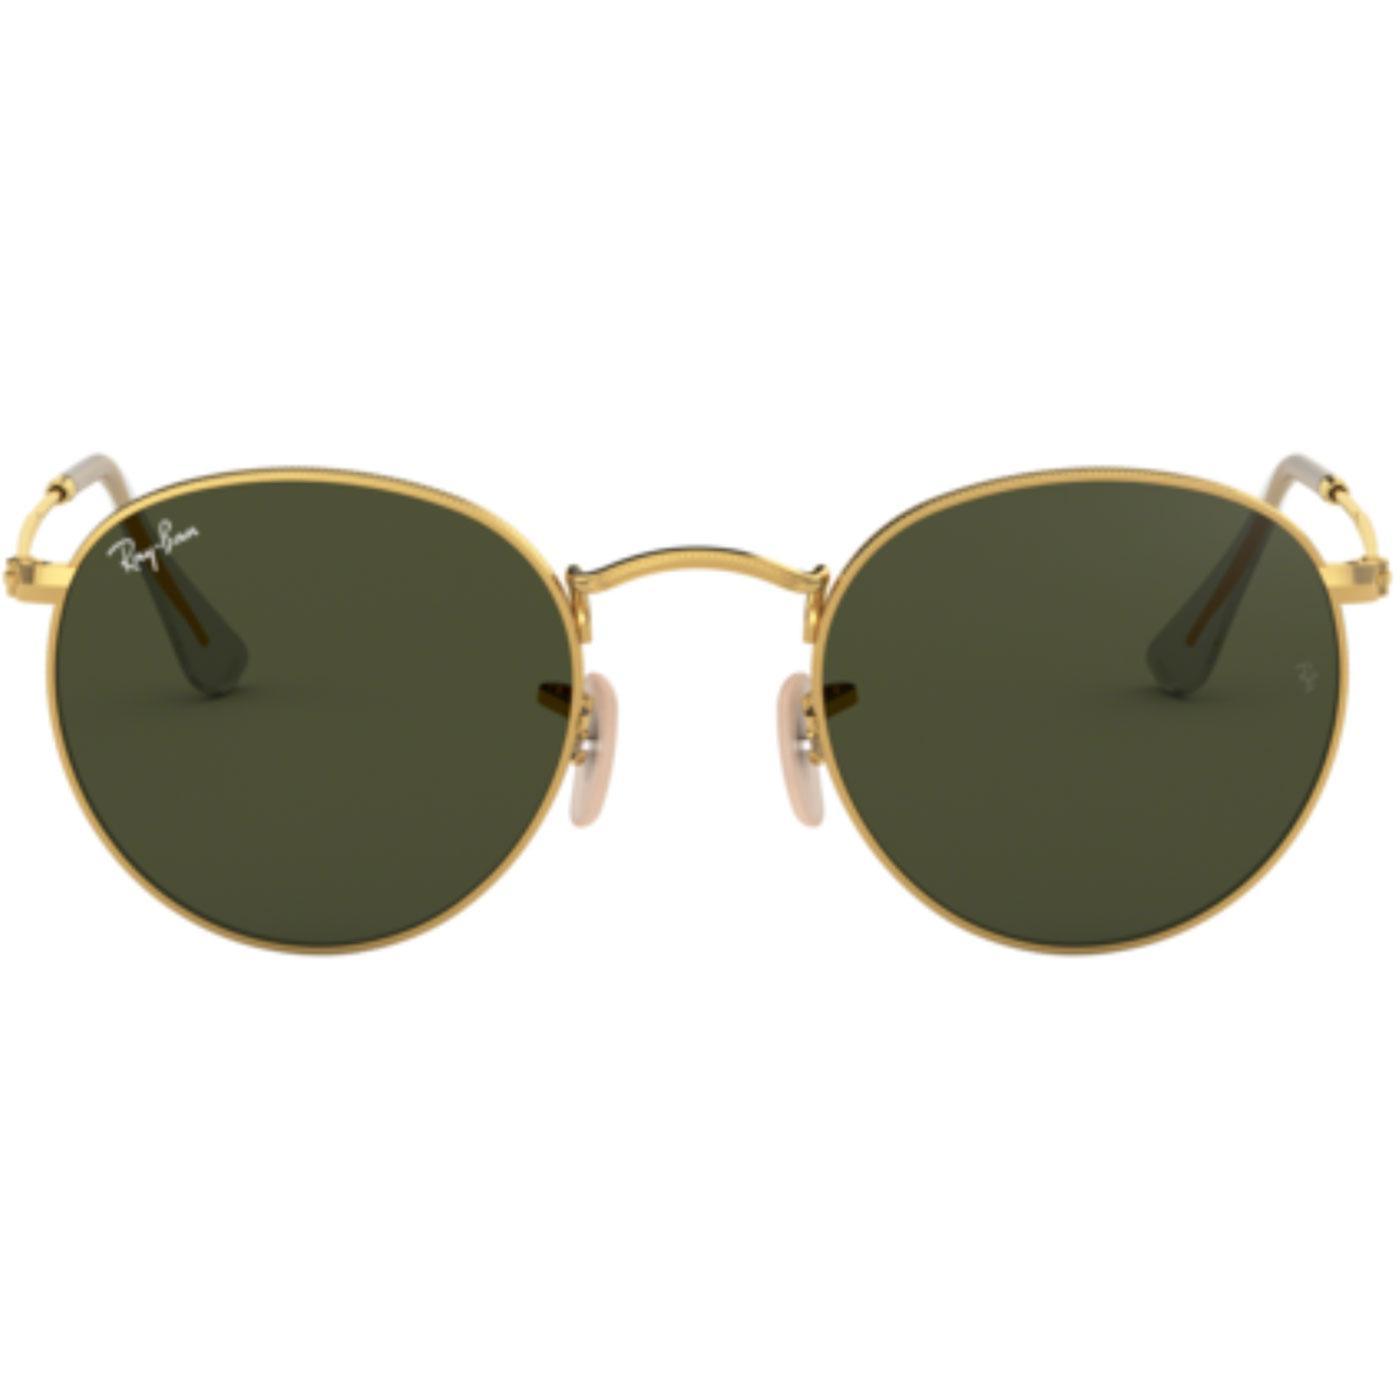 Ray-Ban Round Retro Mod 60s Sunglasses Gold/Green